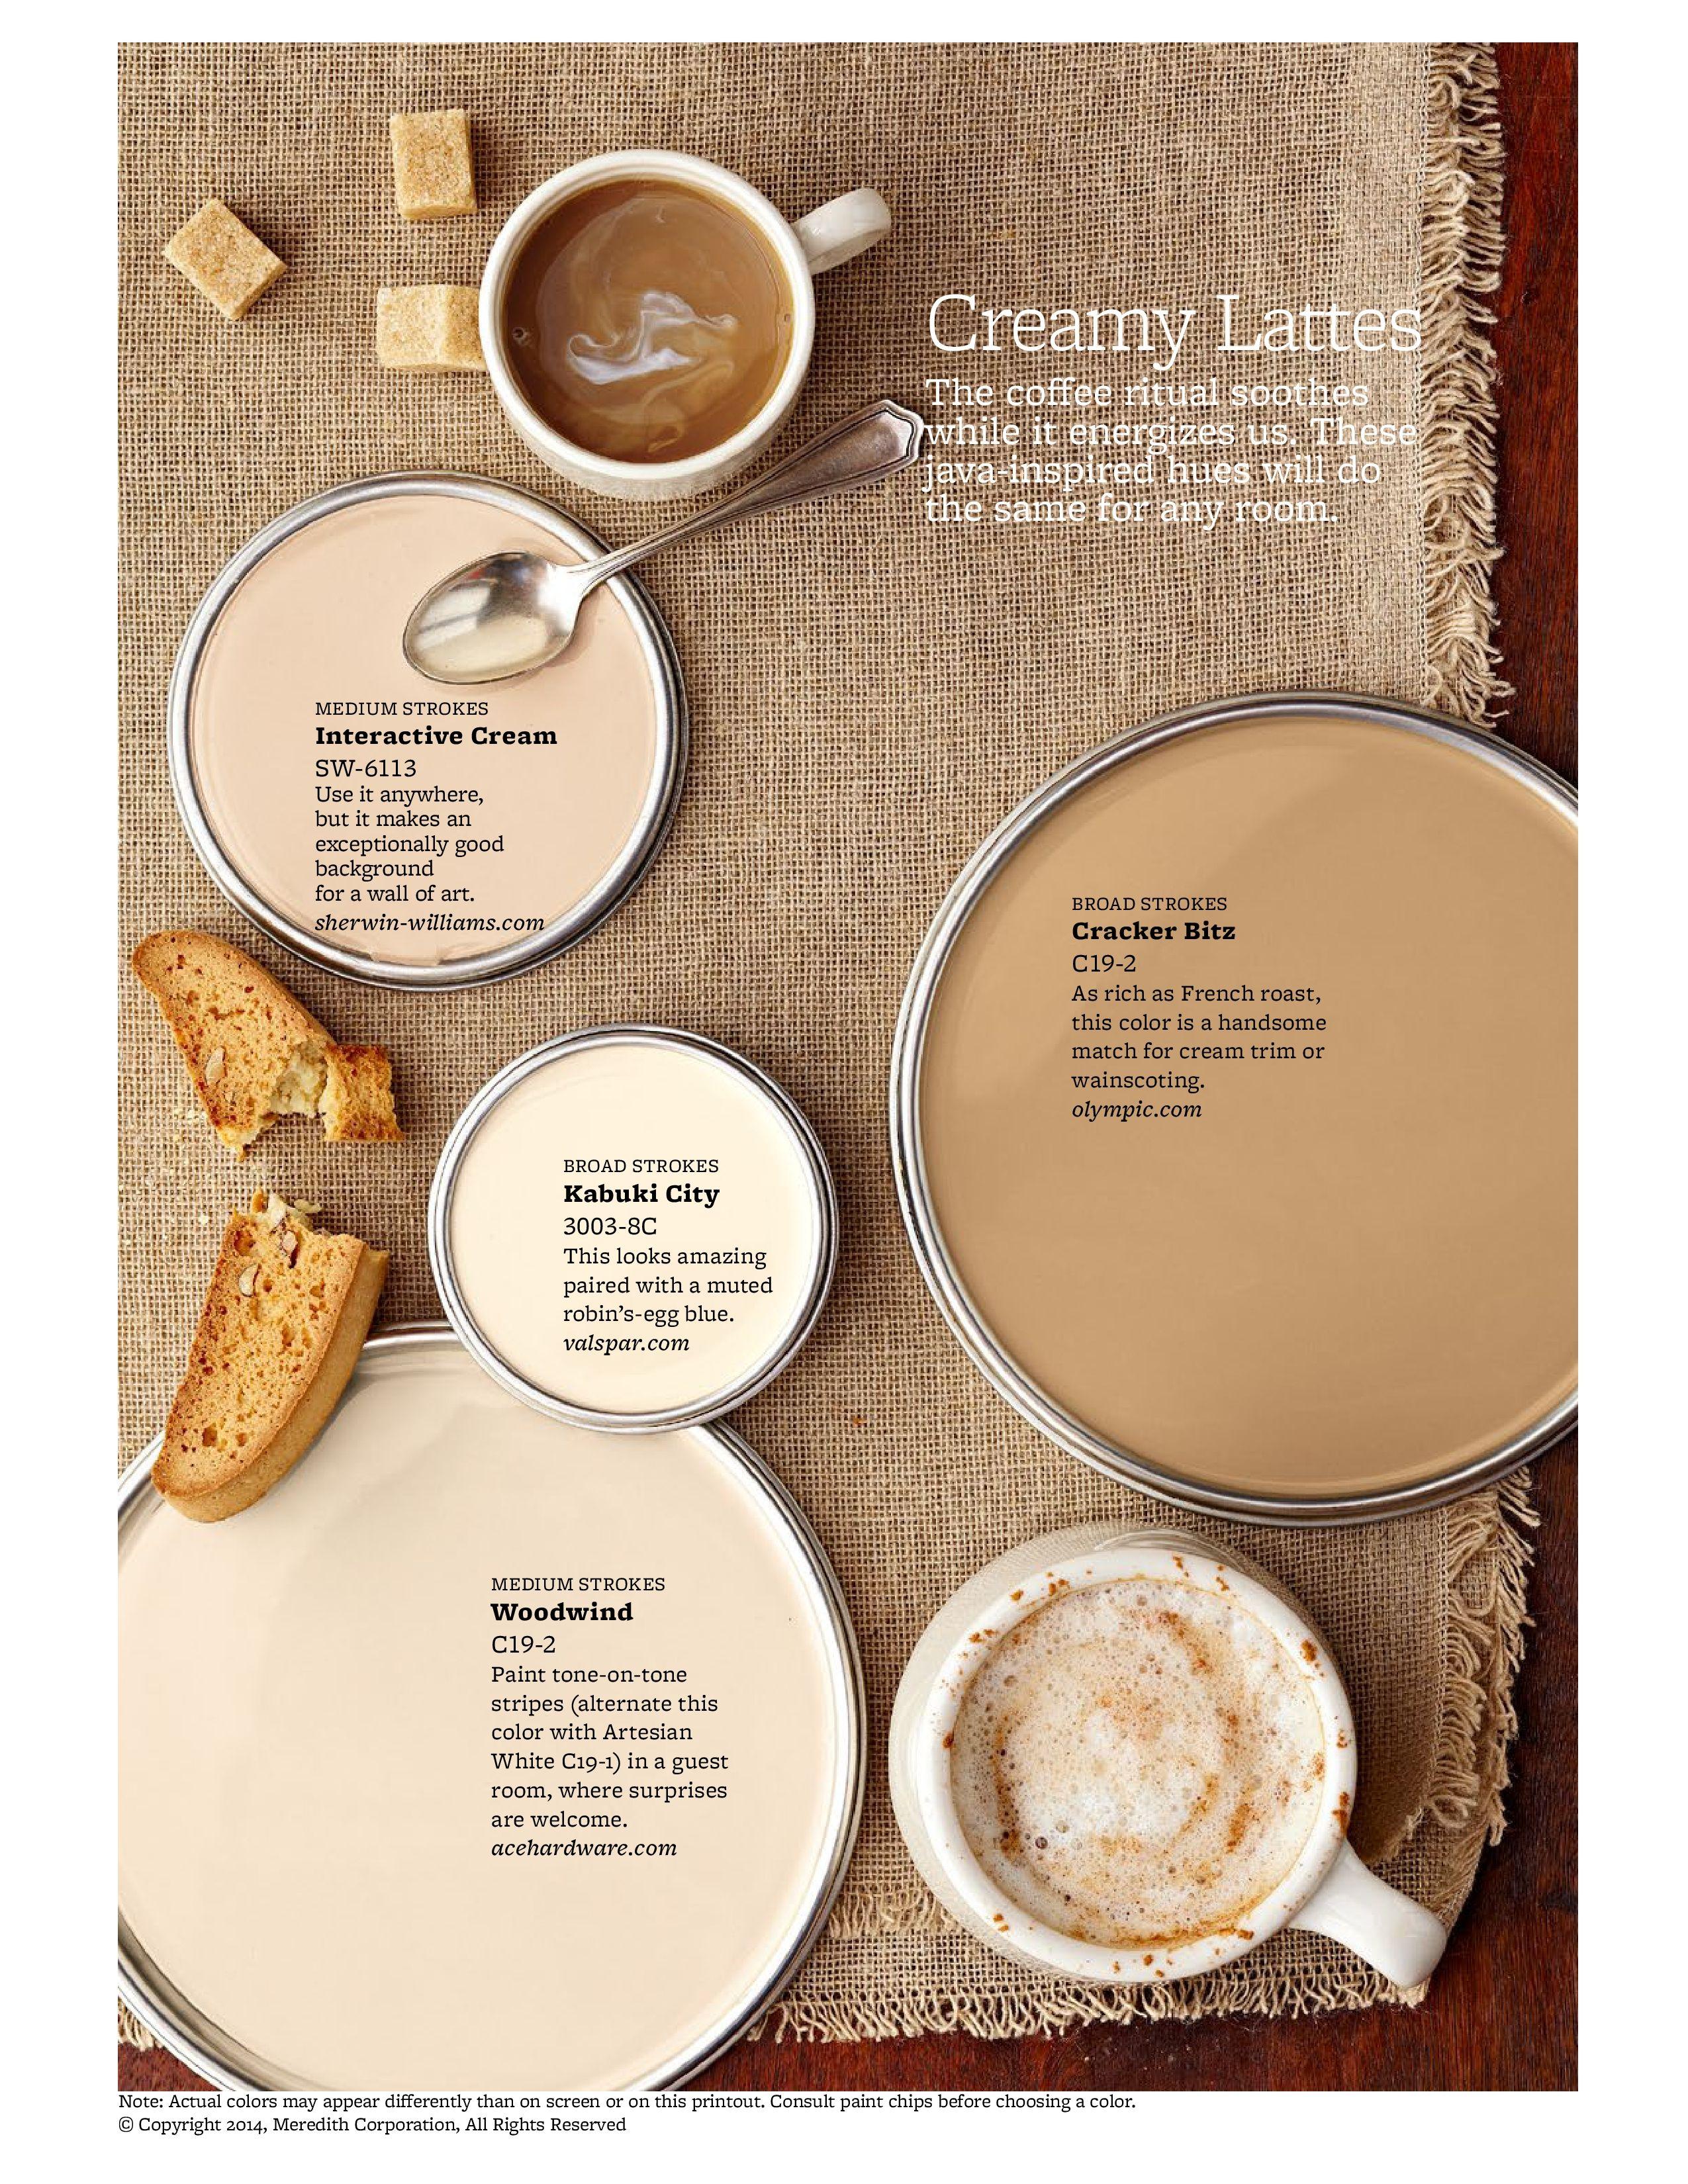 Mocha latte bedroom colors pinned by peachskinsheets